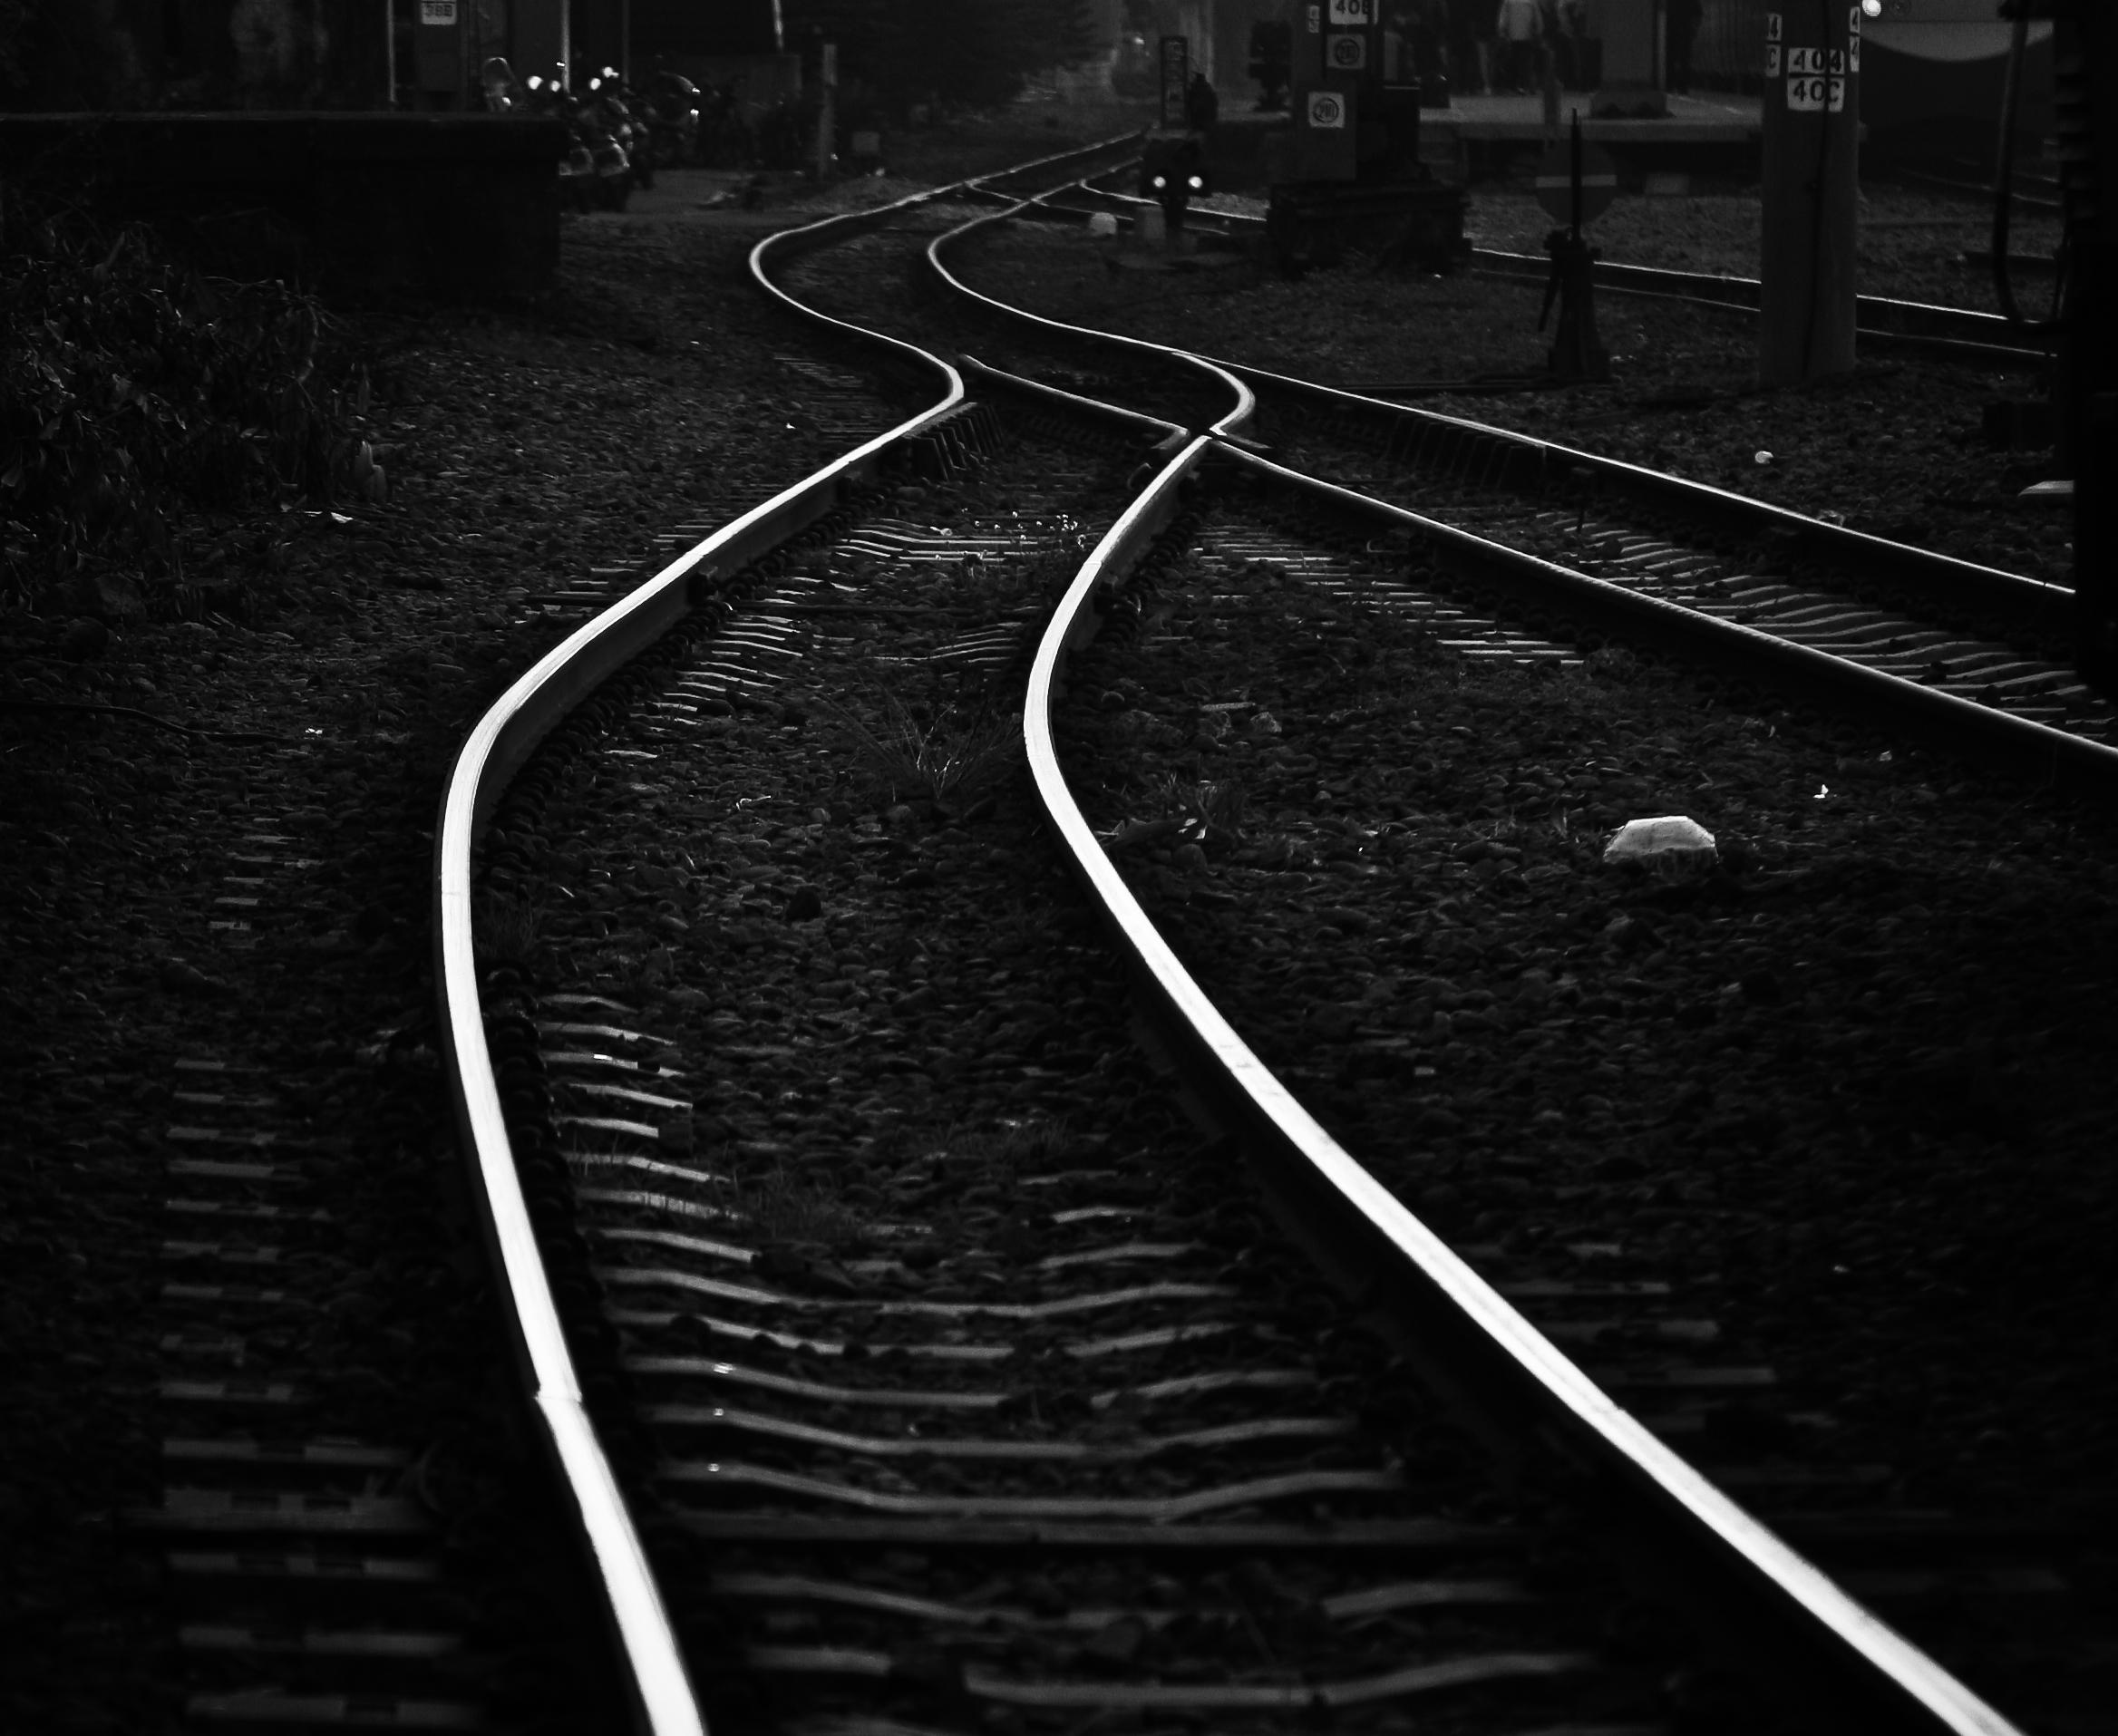 Tracks-8.jpg